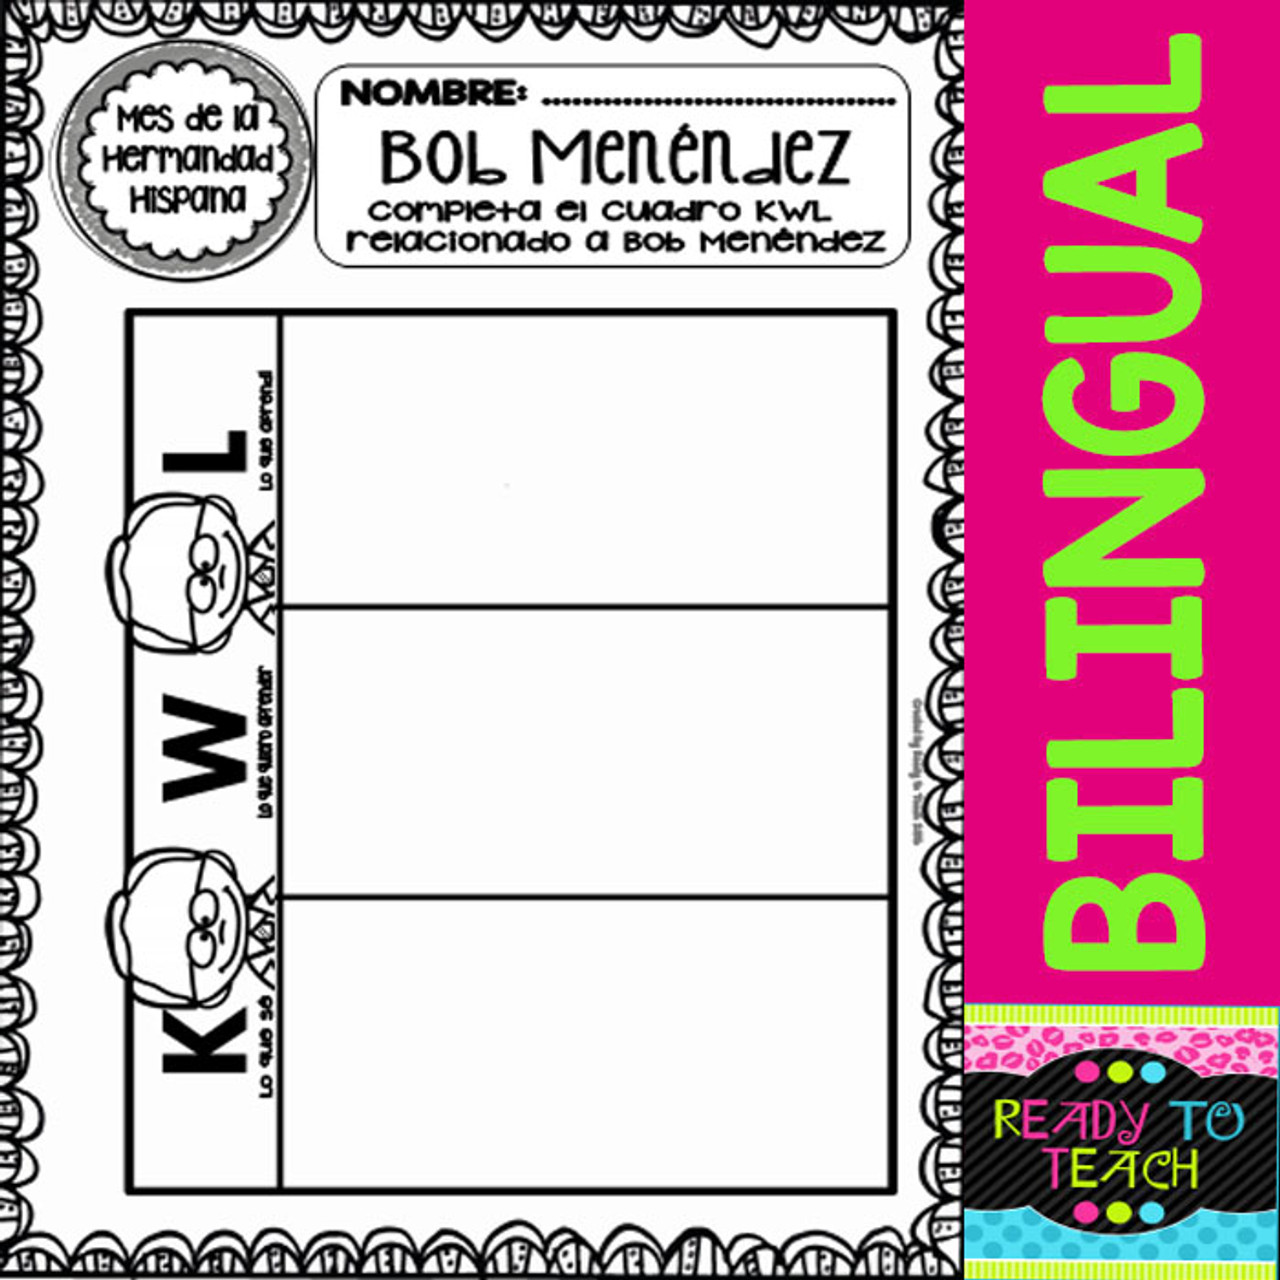 Hispanic Heritage Month - Bob Menendez - Worksheets and Readings (Bilingual)